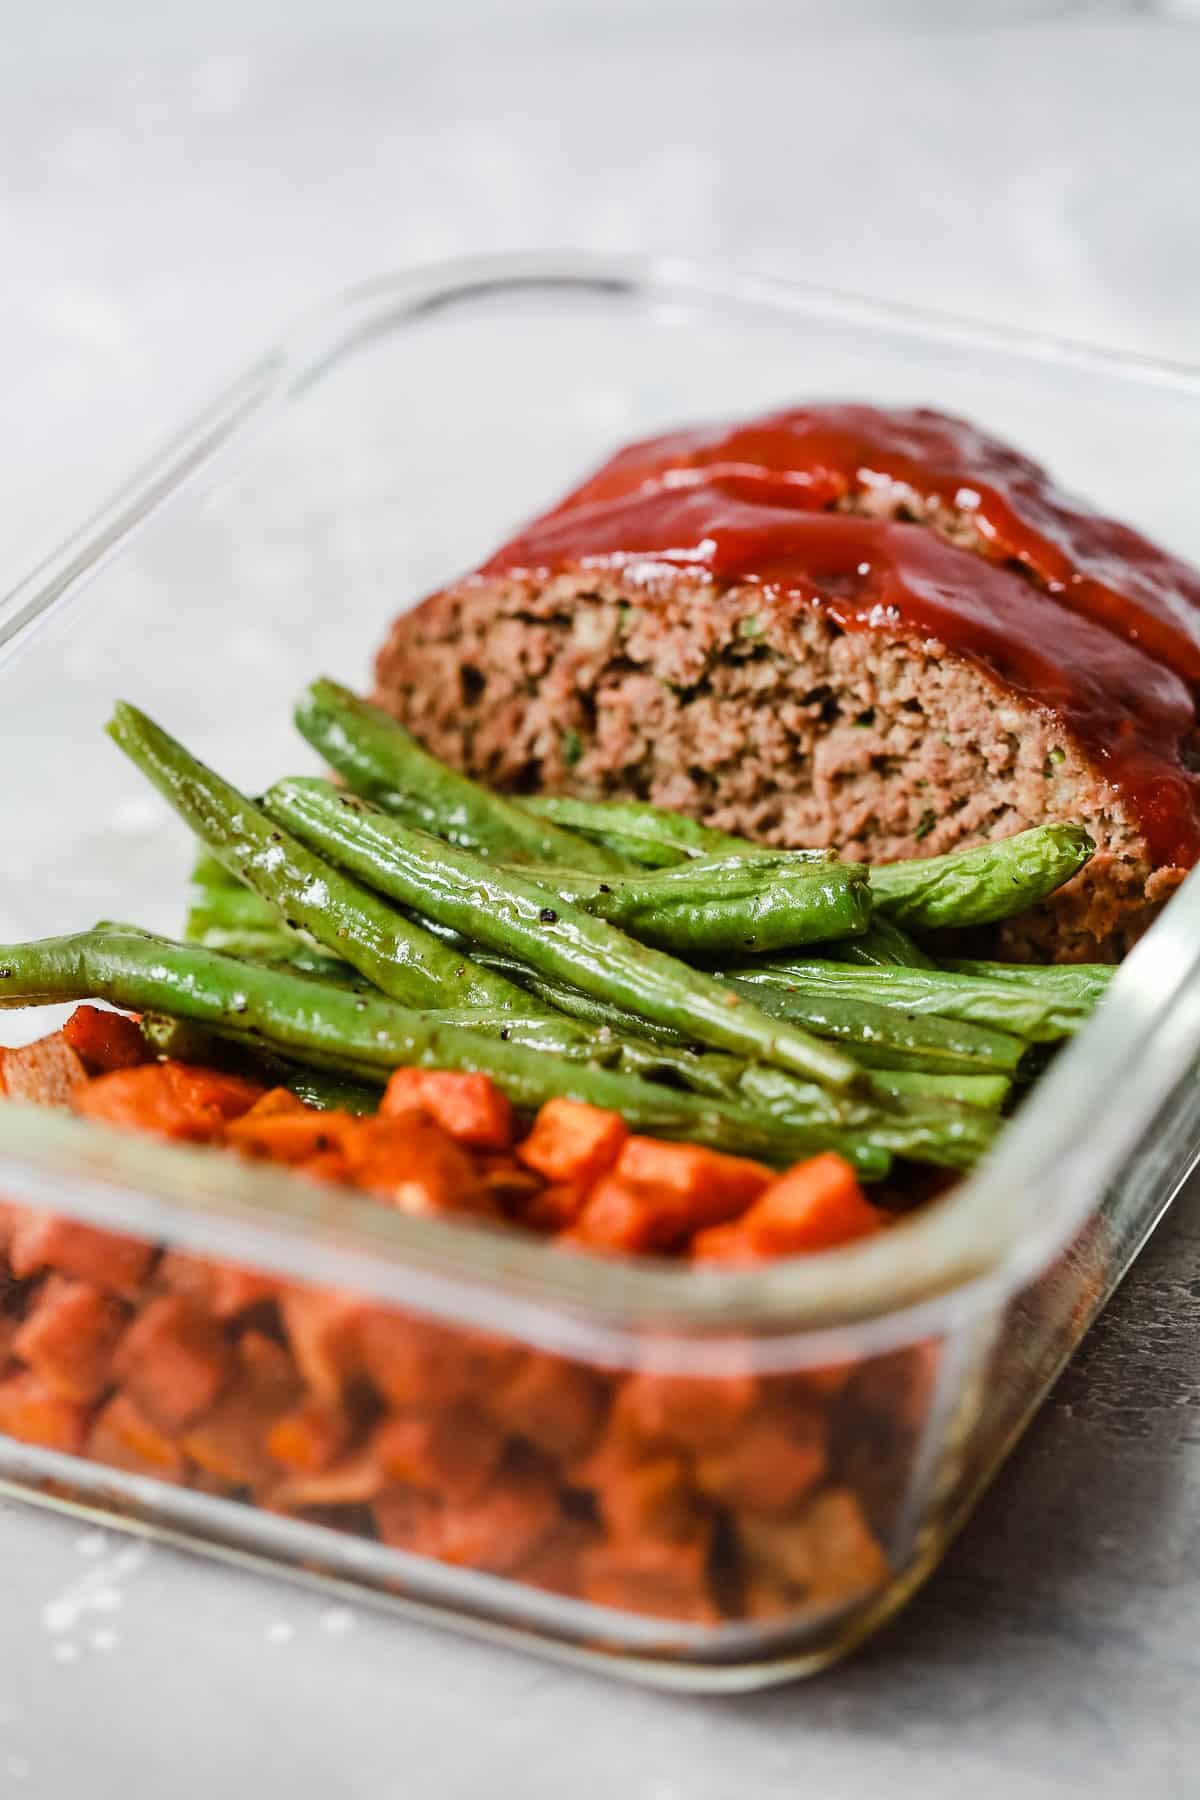 Healthy Meatloaf Meal-Prep Bowls